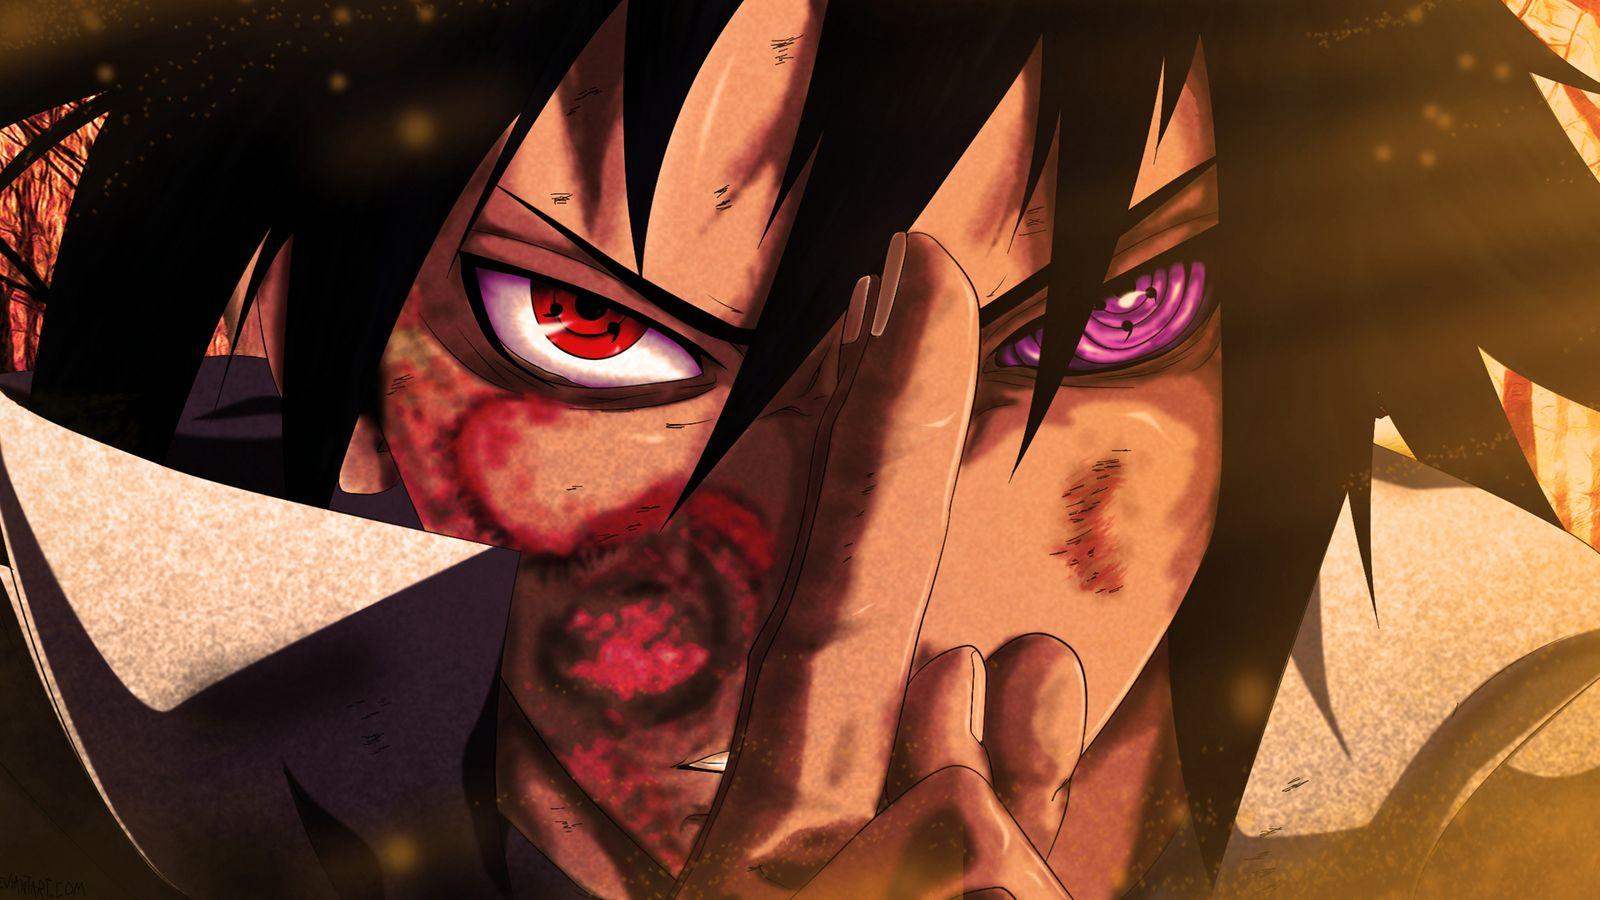 Sasuke Wallpaper Picture Image 1600x900